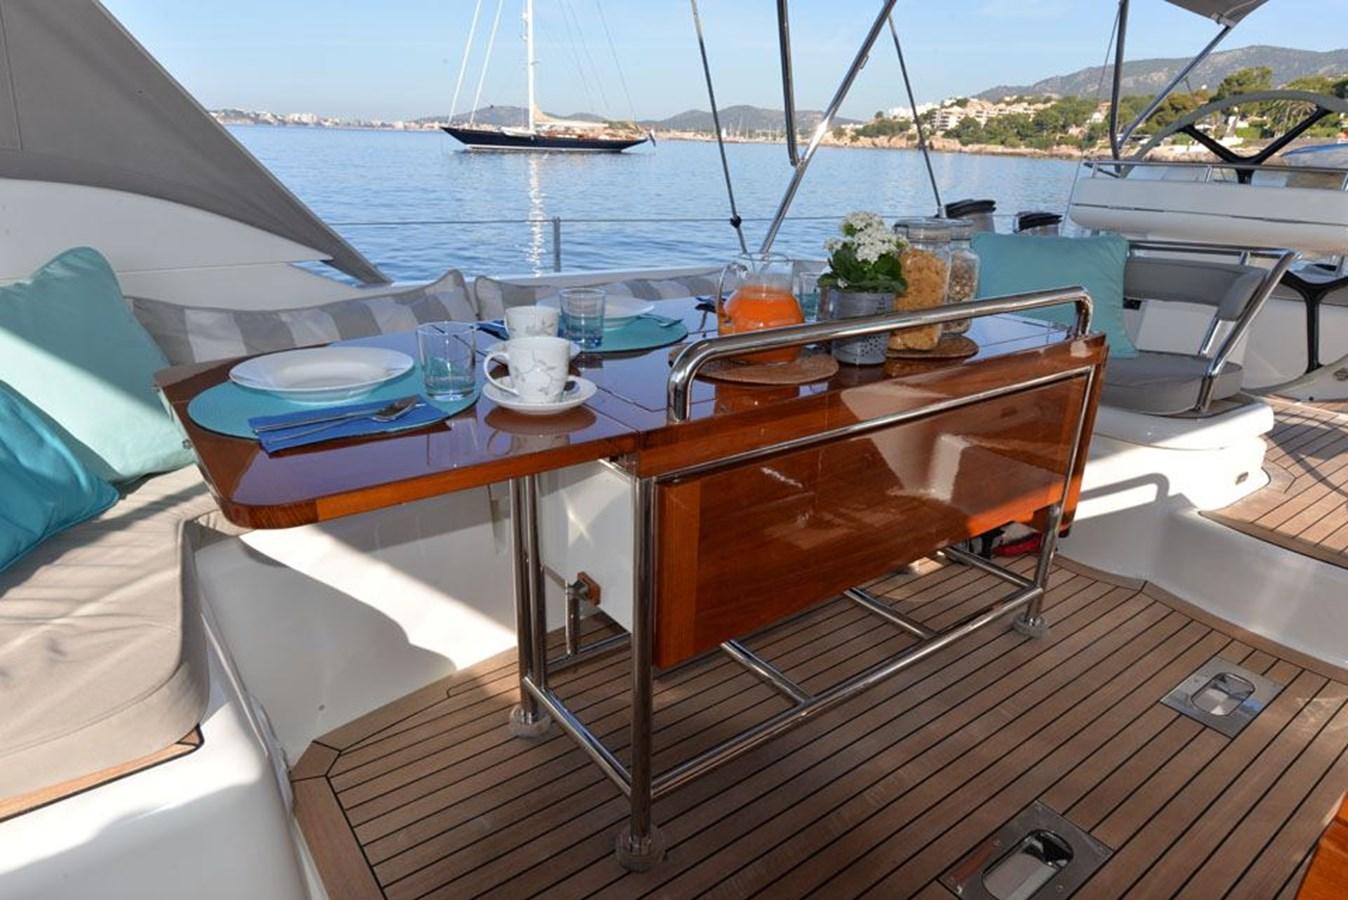 oyster-82-27 2009 OYSTER MARINE LTD Oyster 82 Cruising Sailboat 2806237